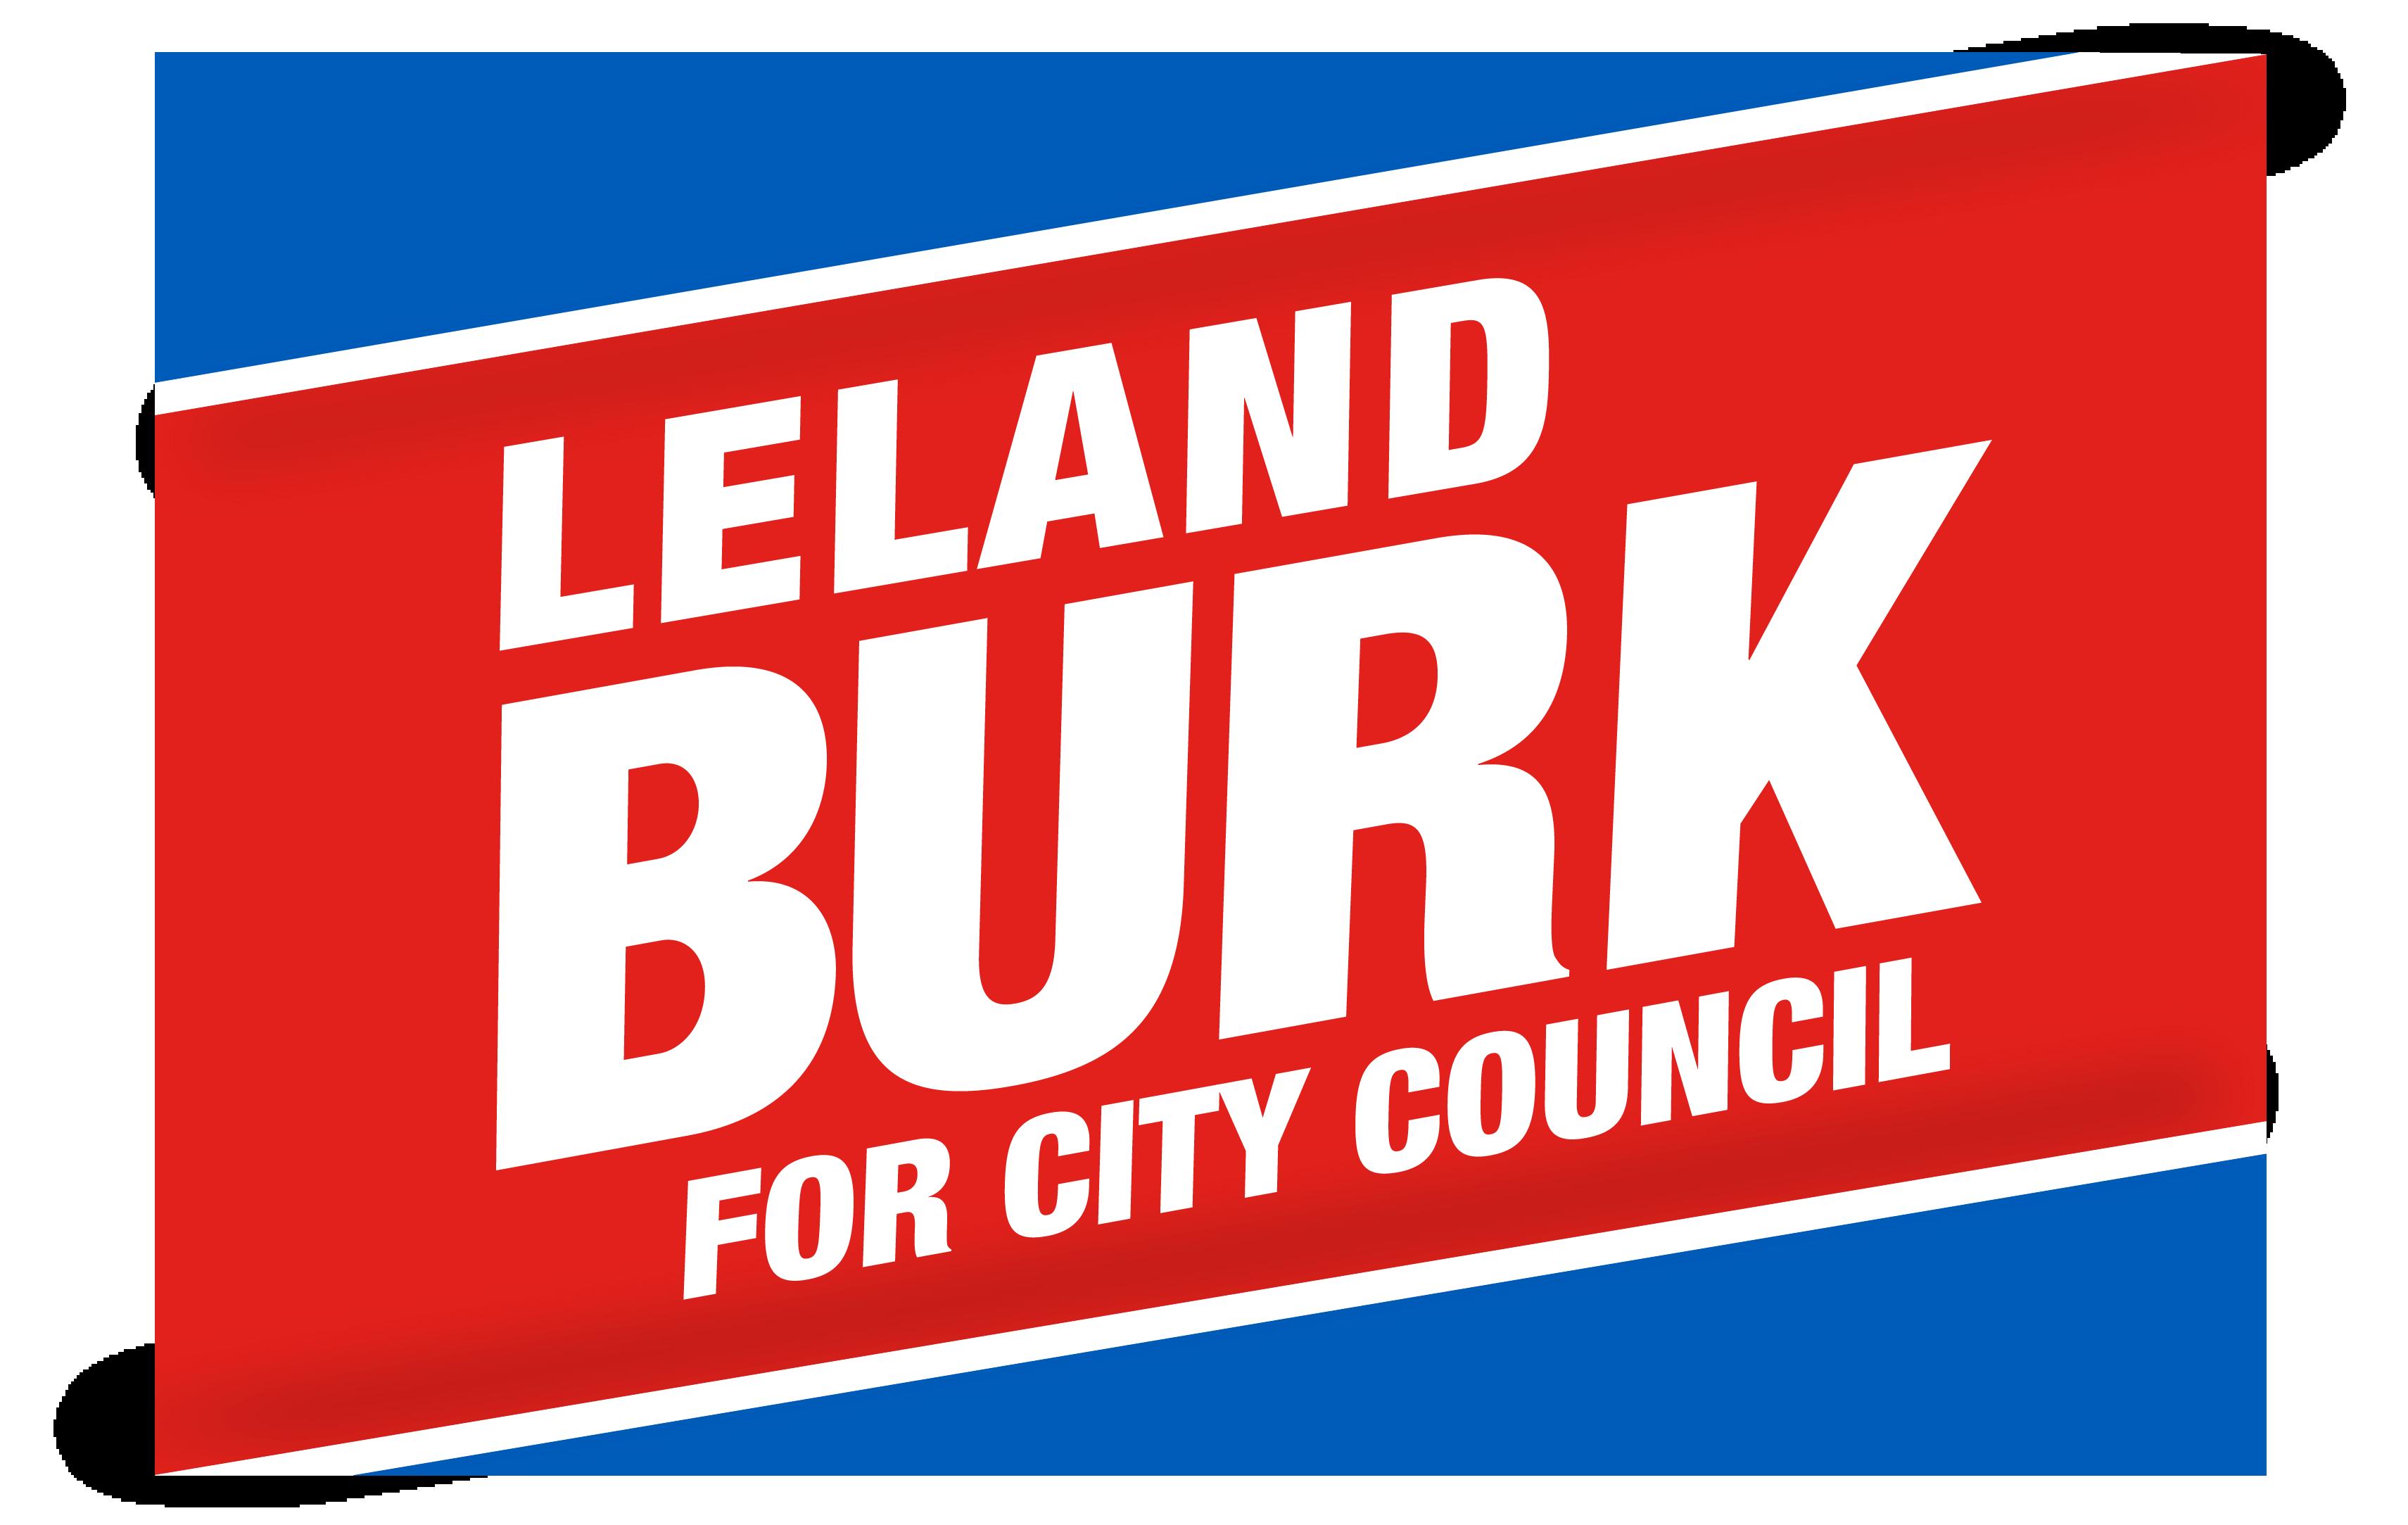 Leland Burk